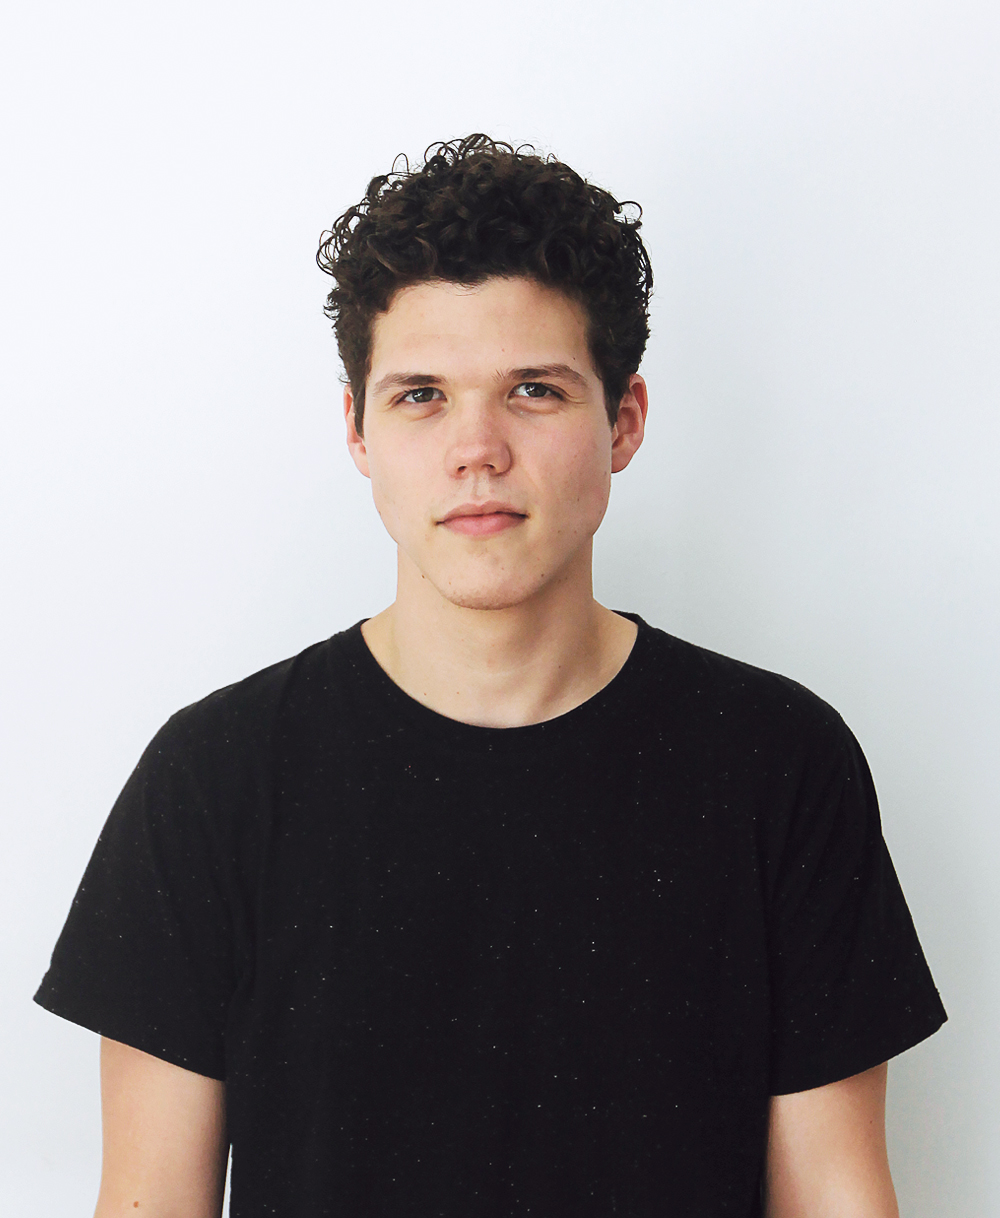 Lucas Macmillan